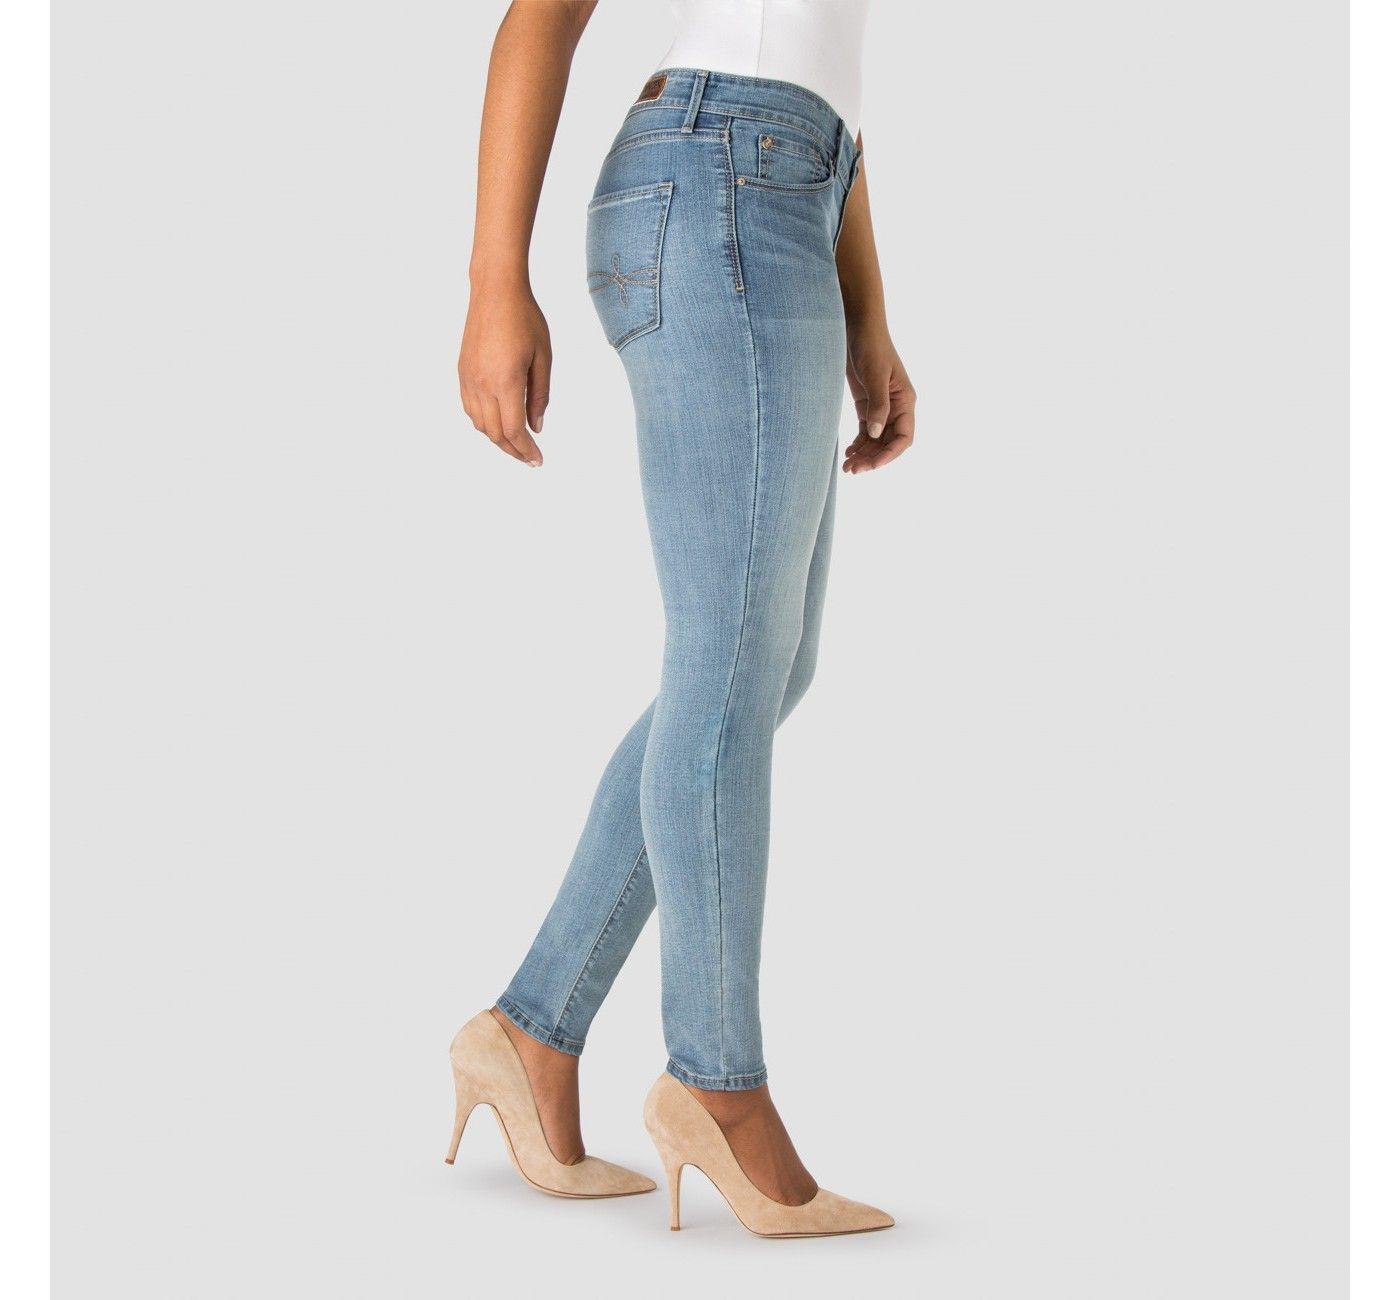 564914b02b92d A Modern Skinny Jeans Bombshell. Women s Levi s® by DENIZEN®.  afflink    skinnyjeans  denizen  levis